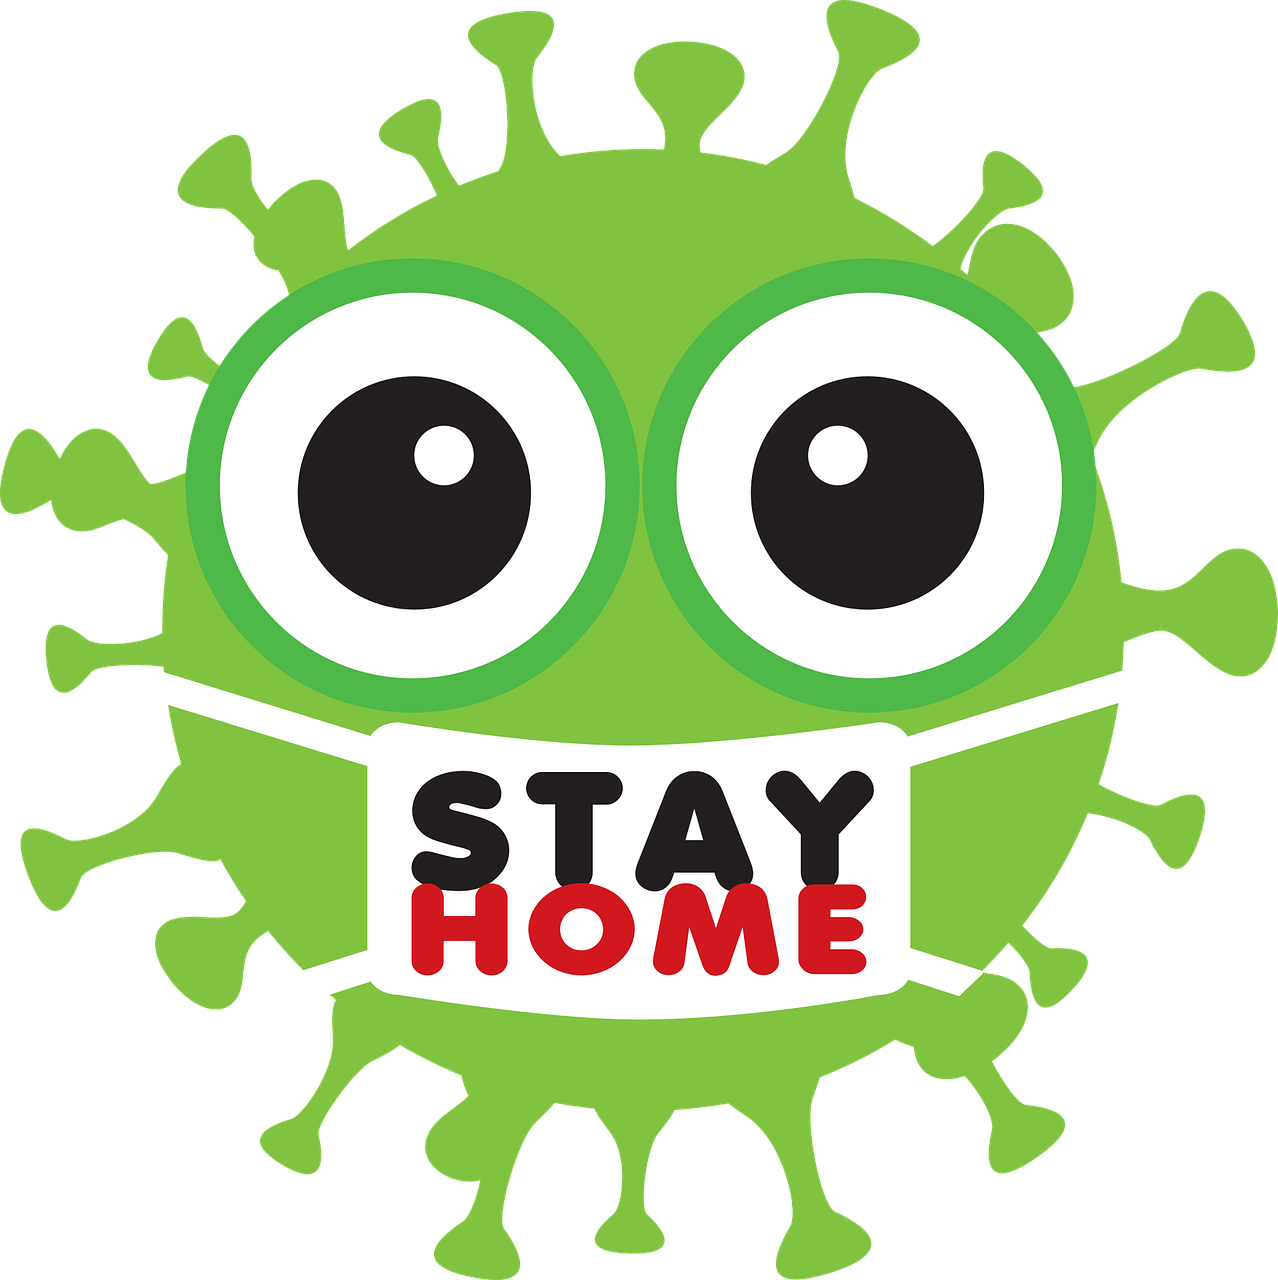 covid-19 virus stay at home cartoon